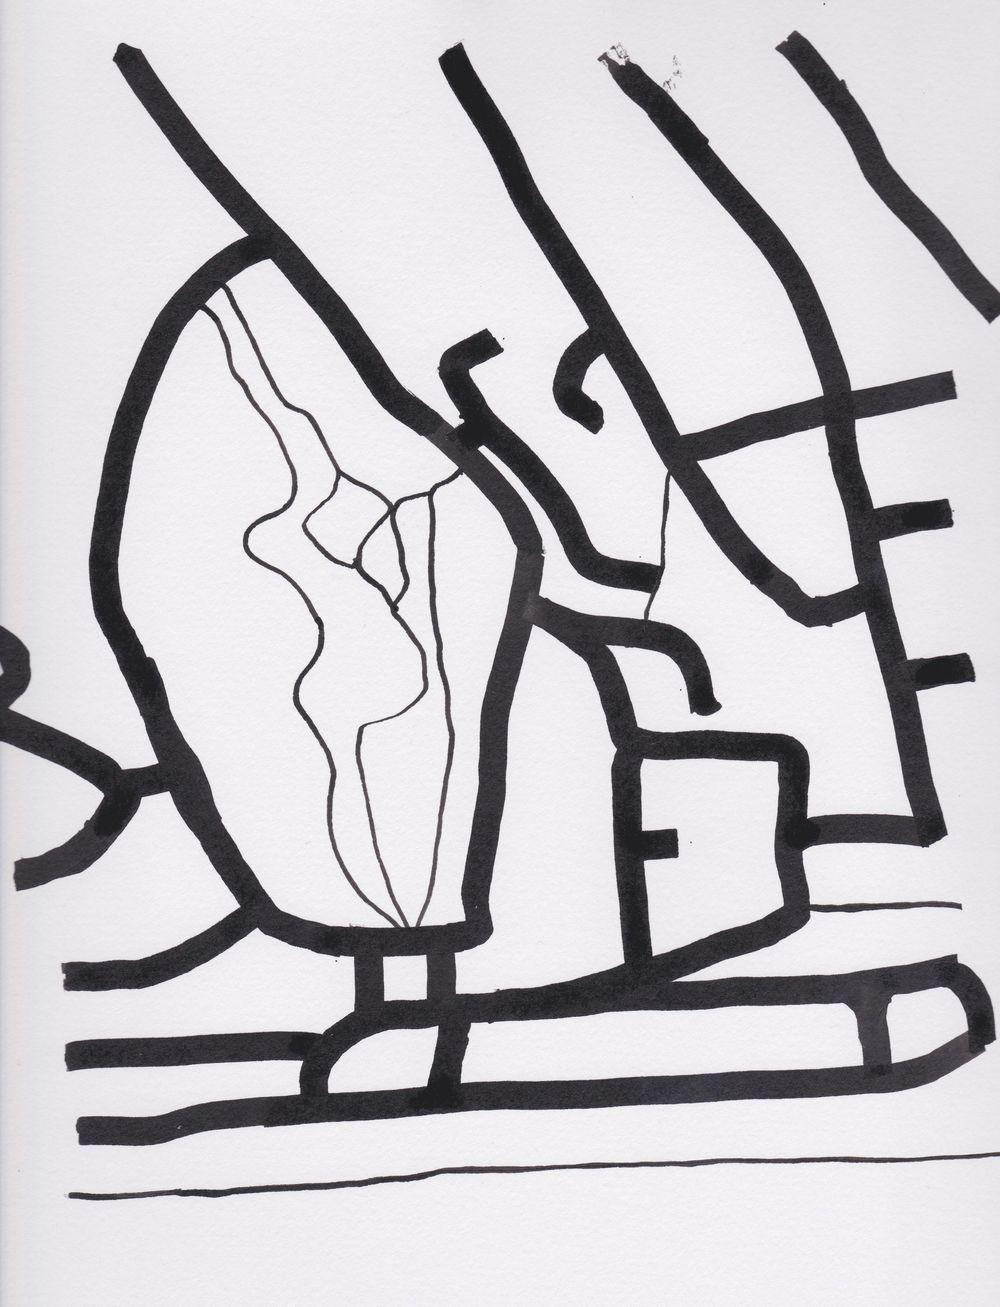 St Leonards Map - image 2 - student project